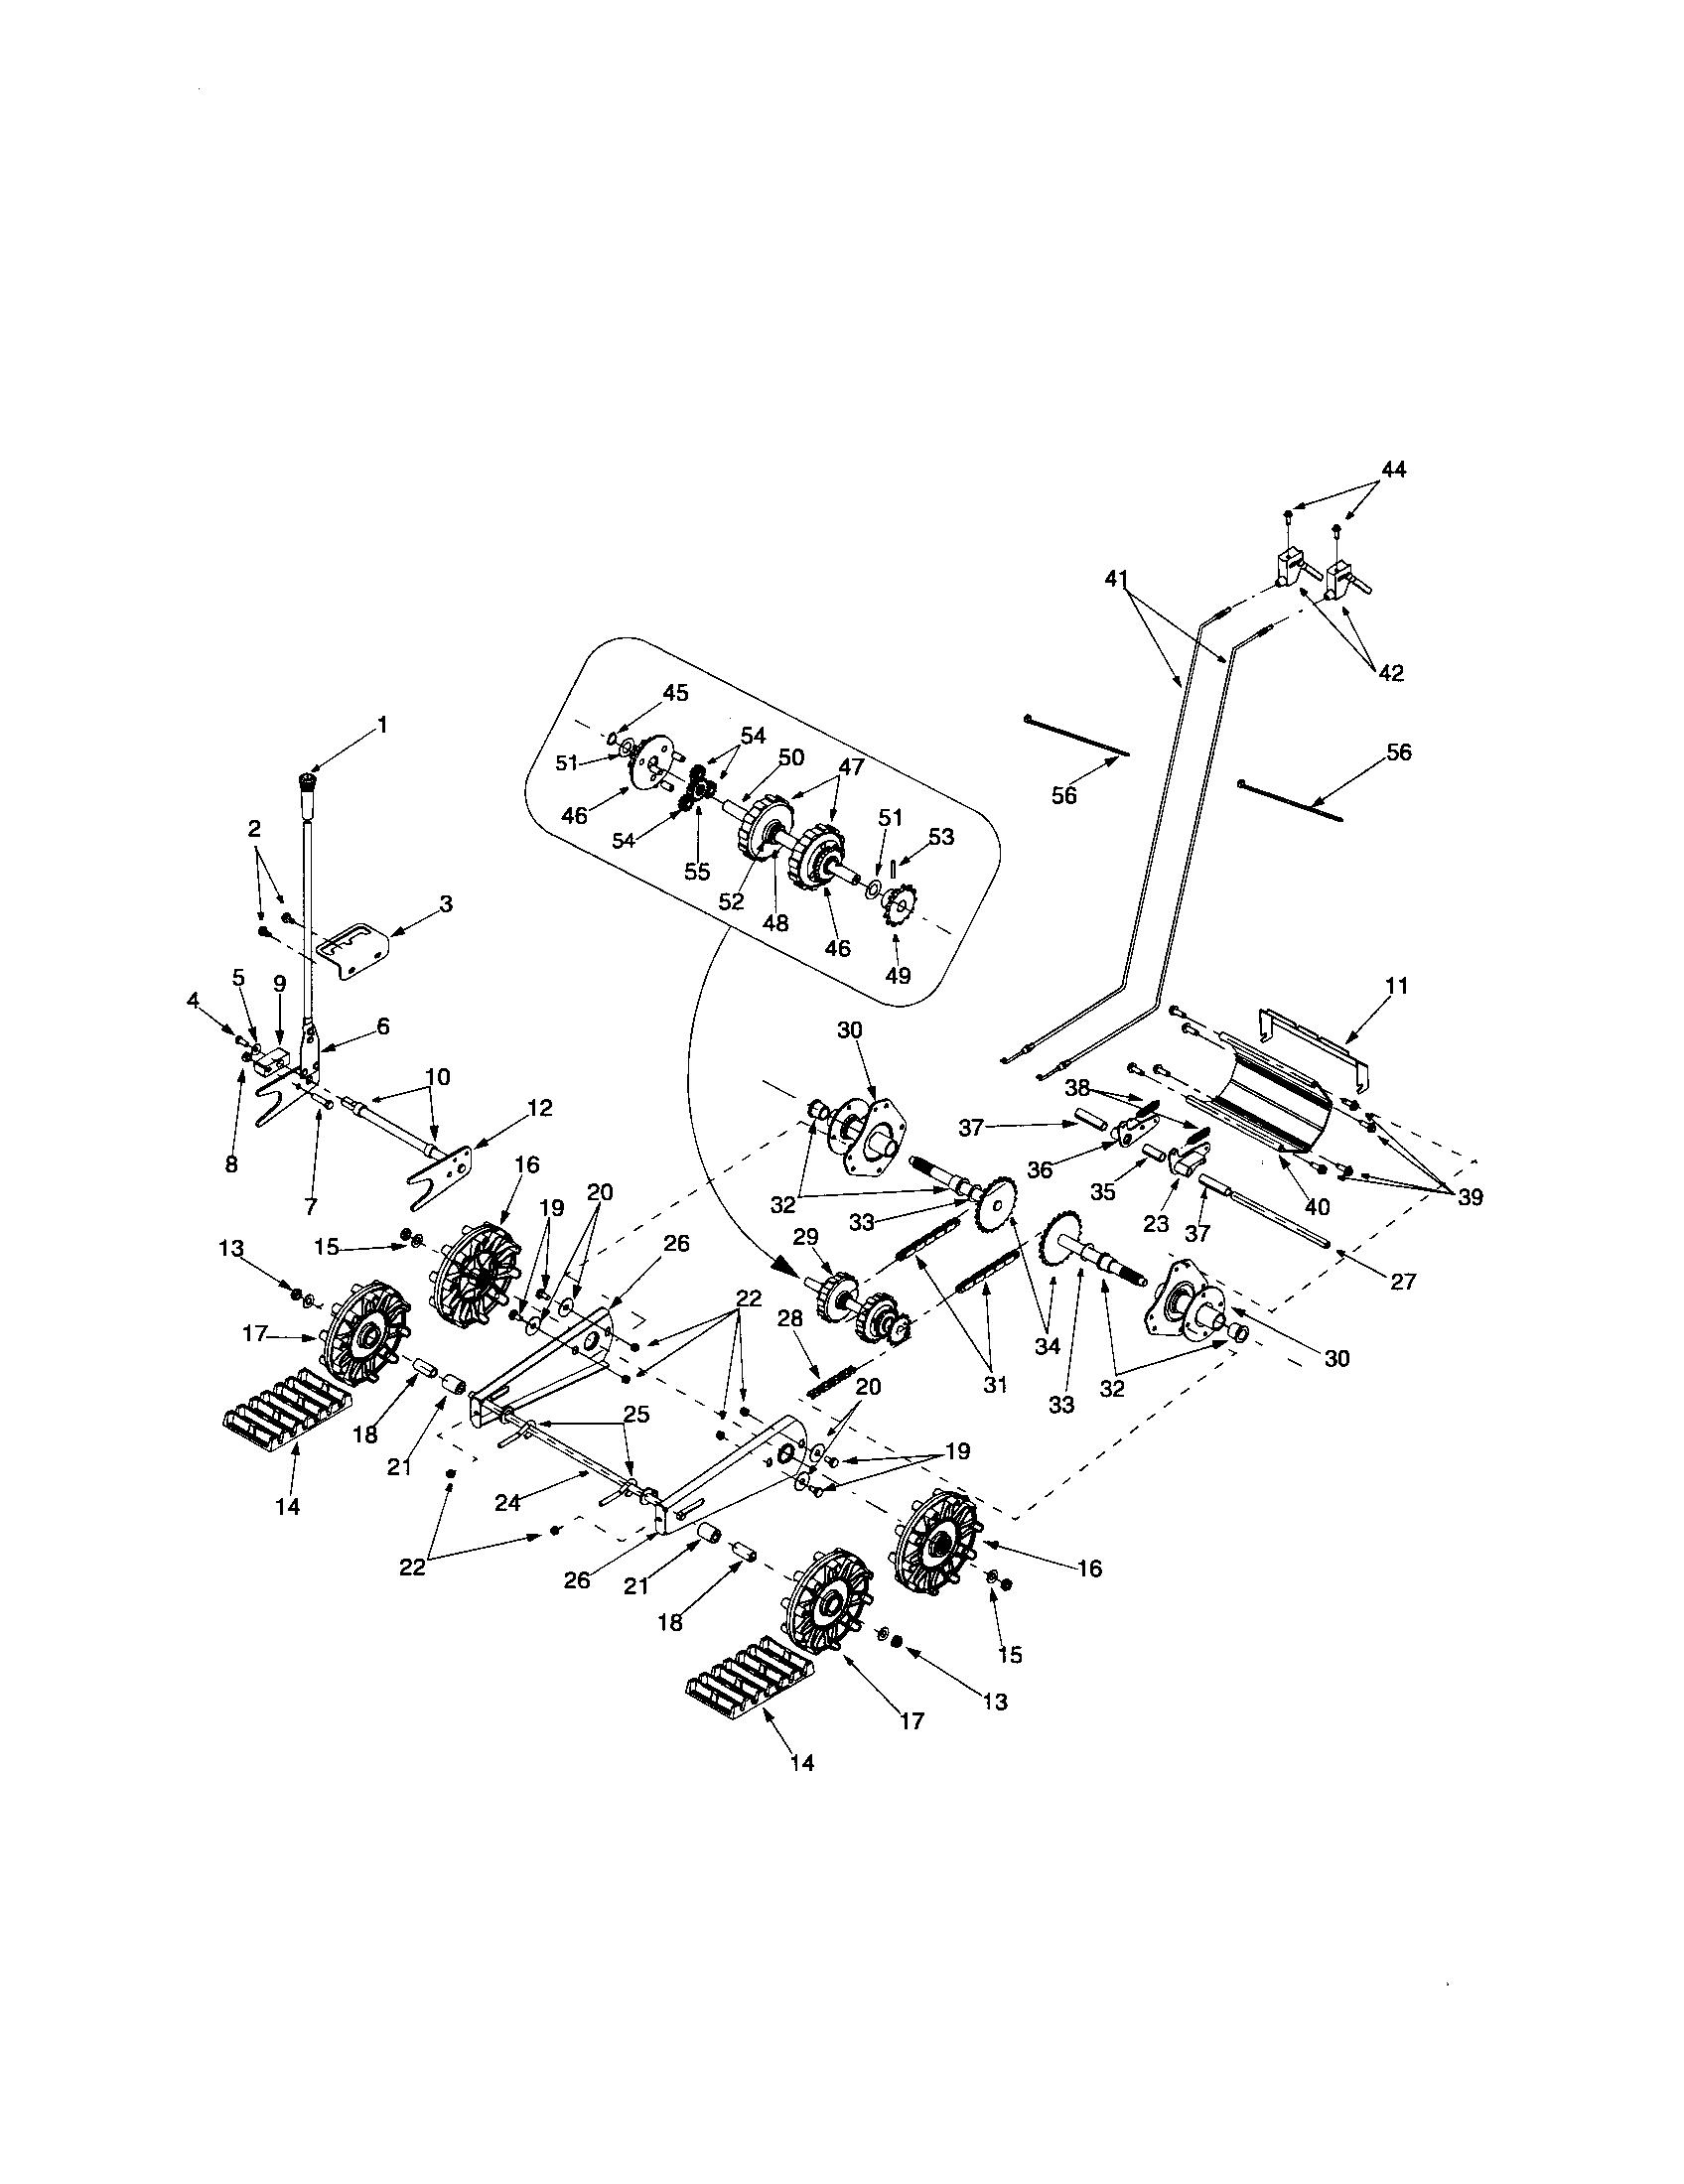 Troybilt model 1130 snowthrower, gas genuine parts